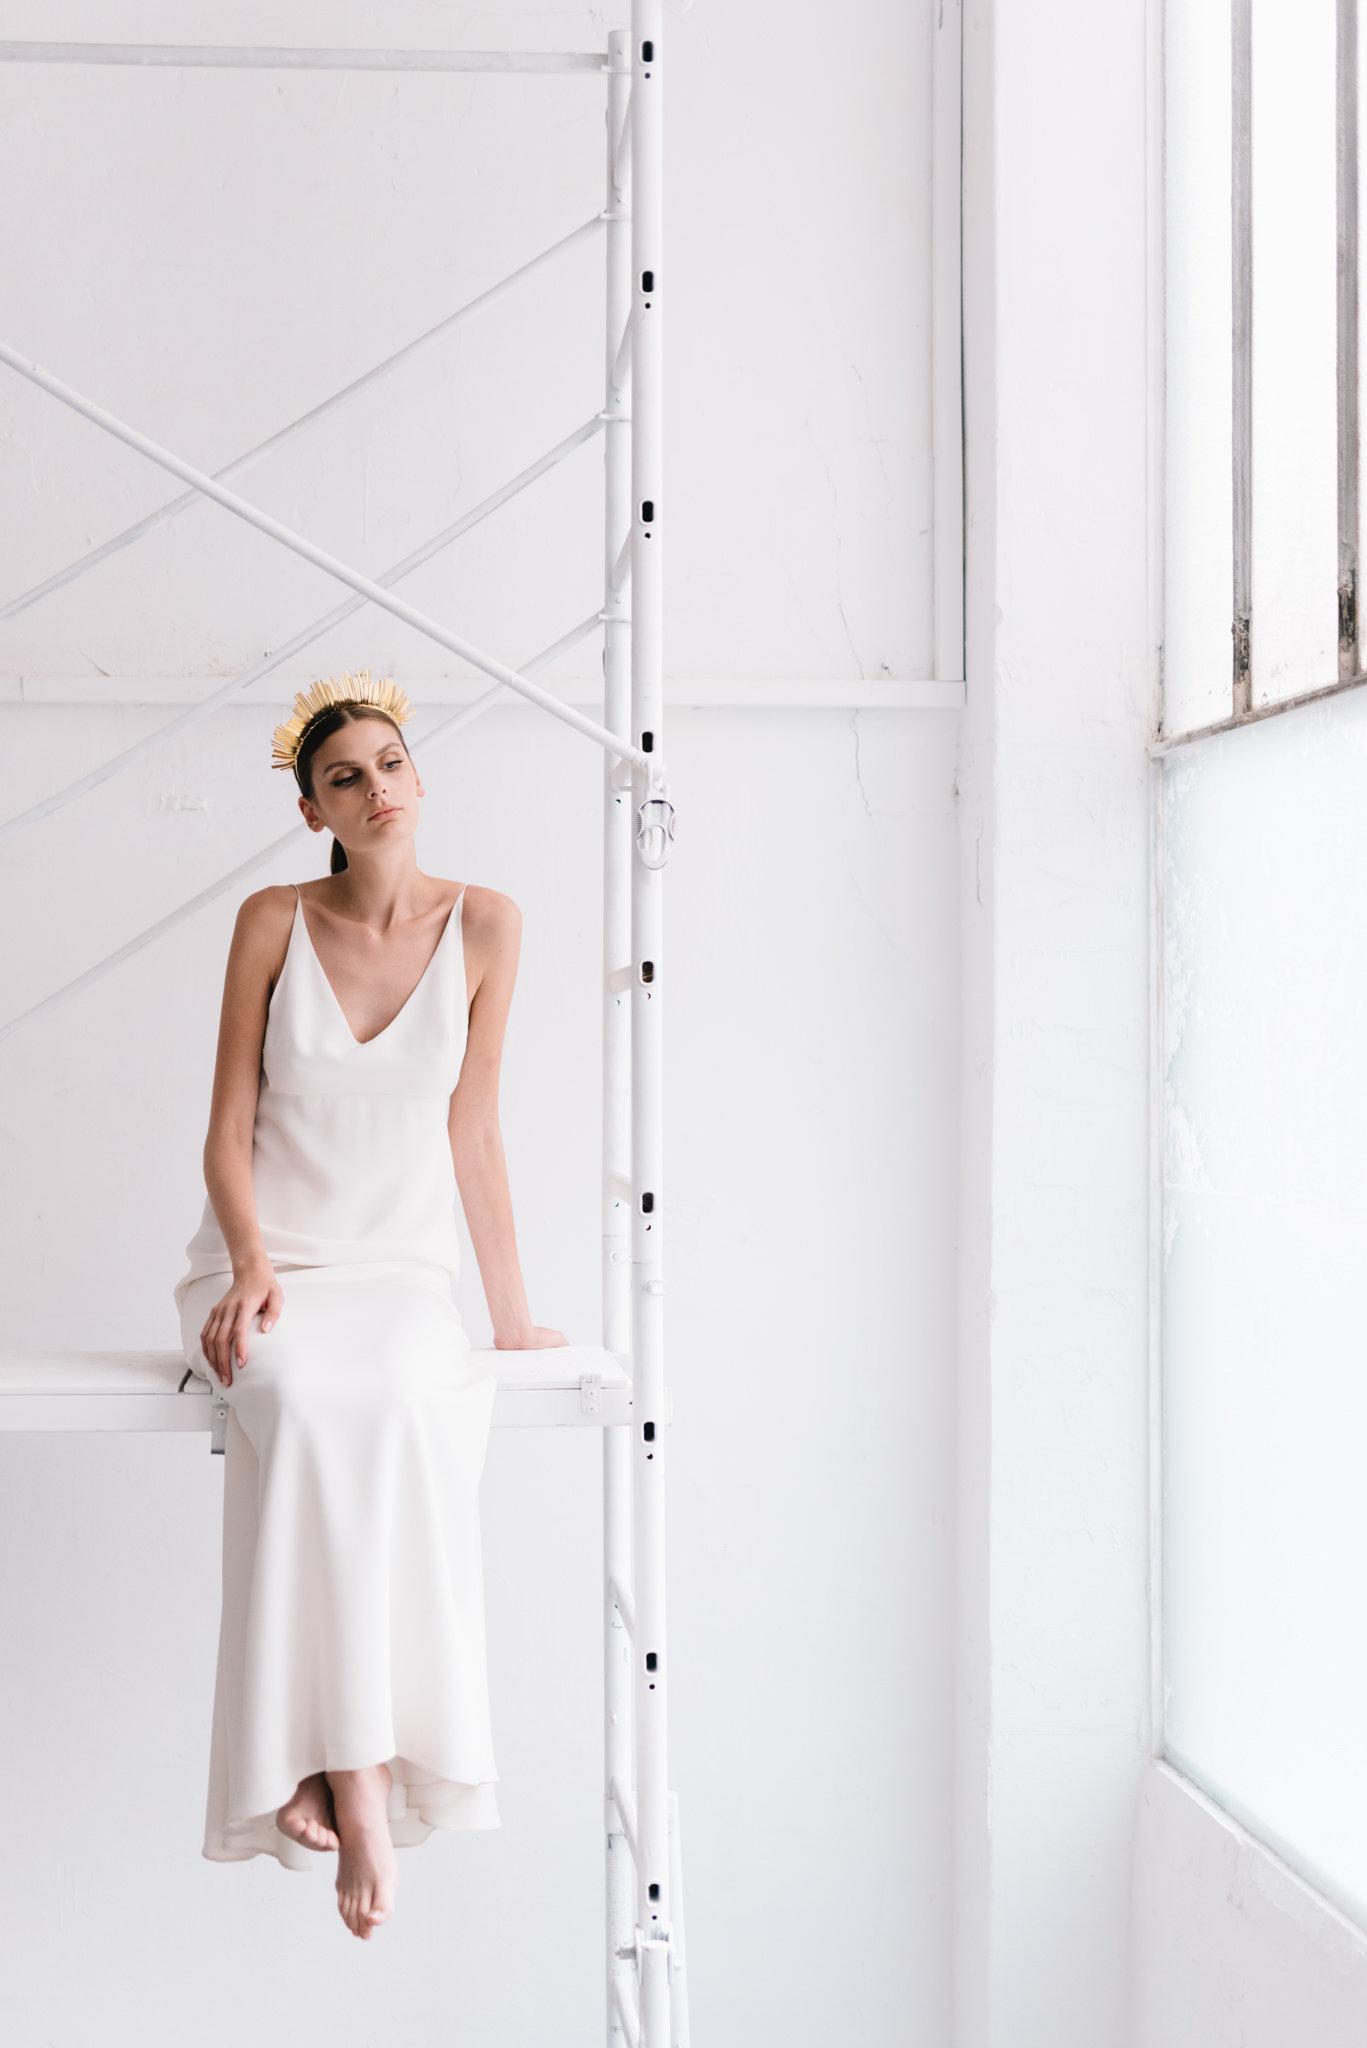 parisian-inspired-blog-mariagemaisonsabben-accessoires-mariee-icone-couronne-1.jpg